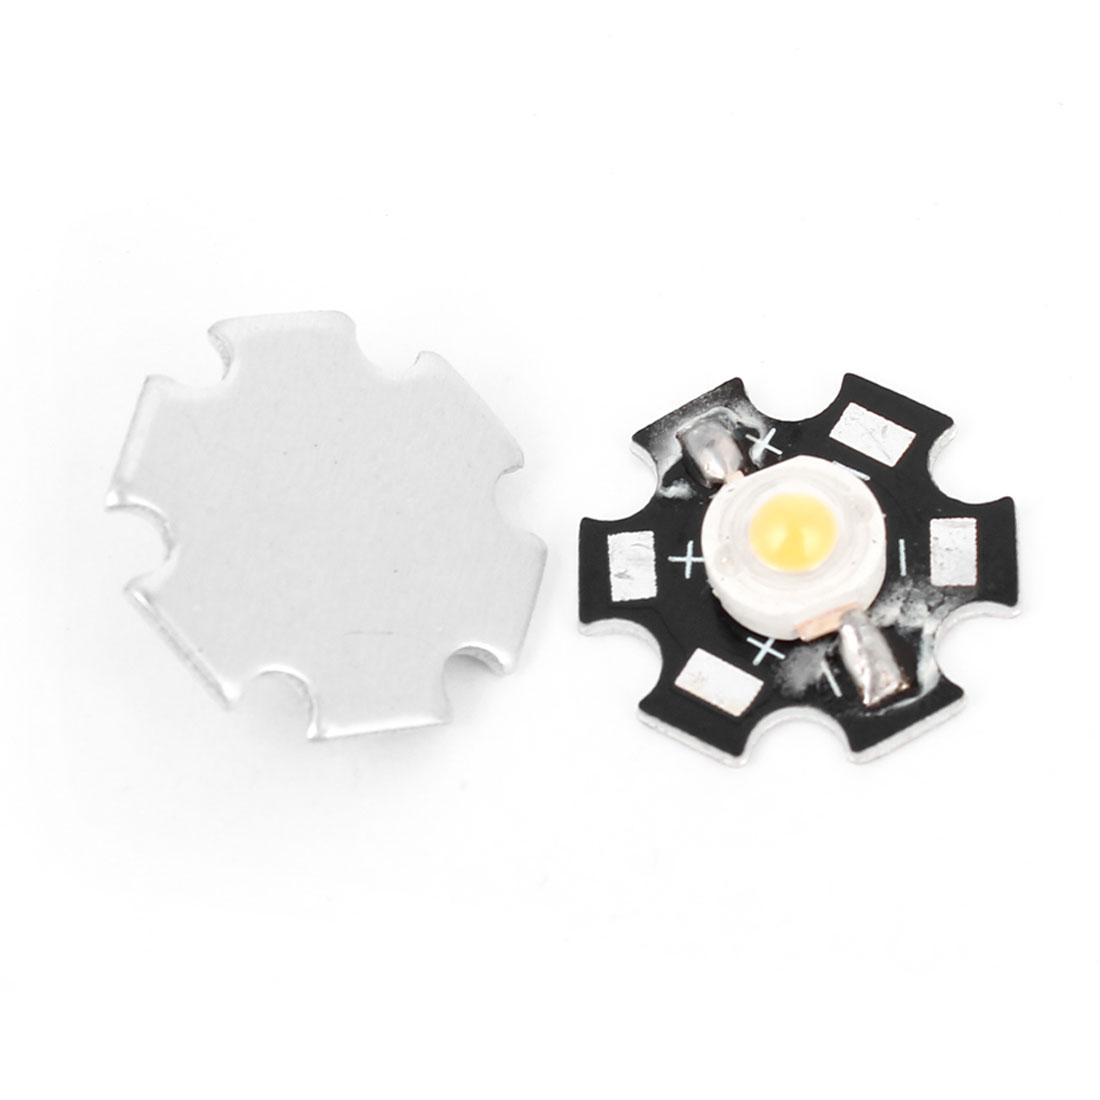 2pcs 1W 3000-3500K Warm White Light LED Lamp Bead Emitter 110-120LM w Star Base